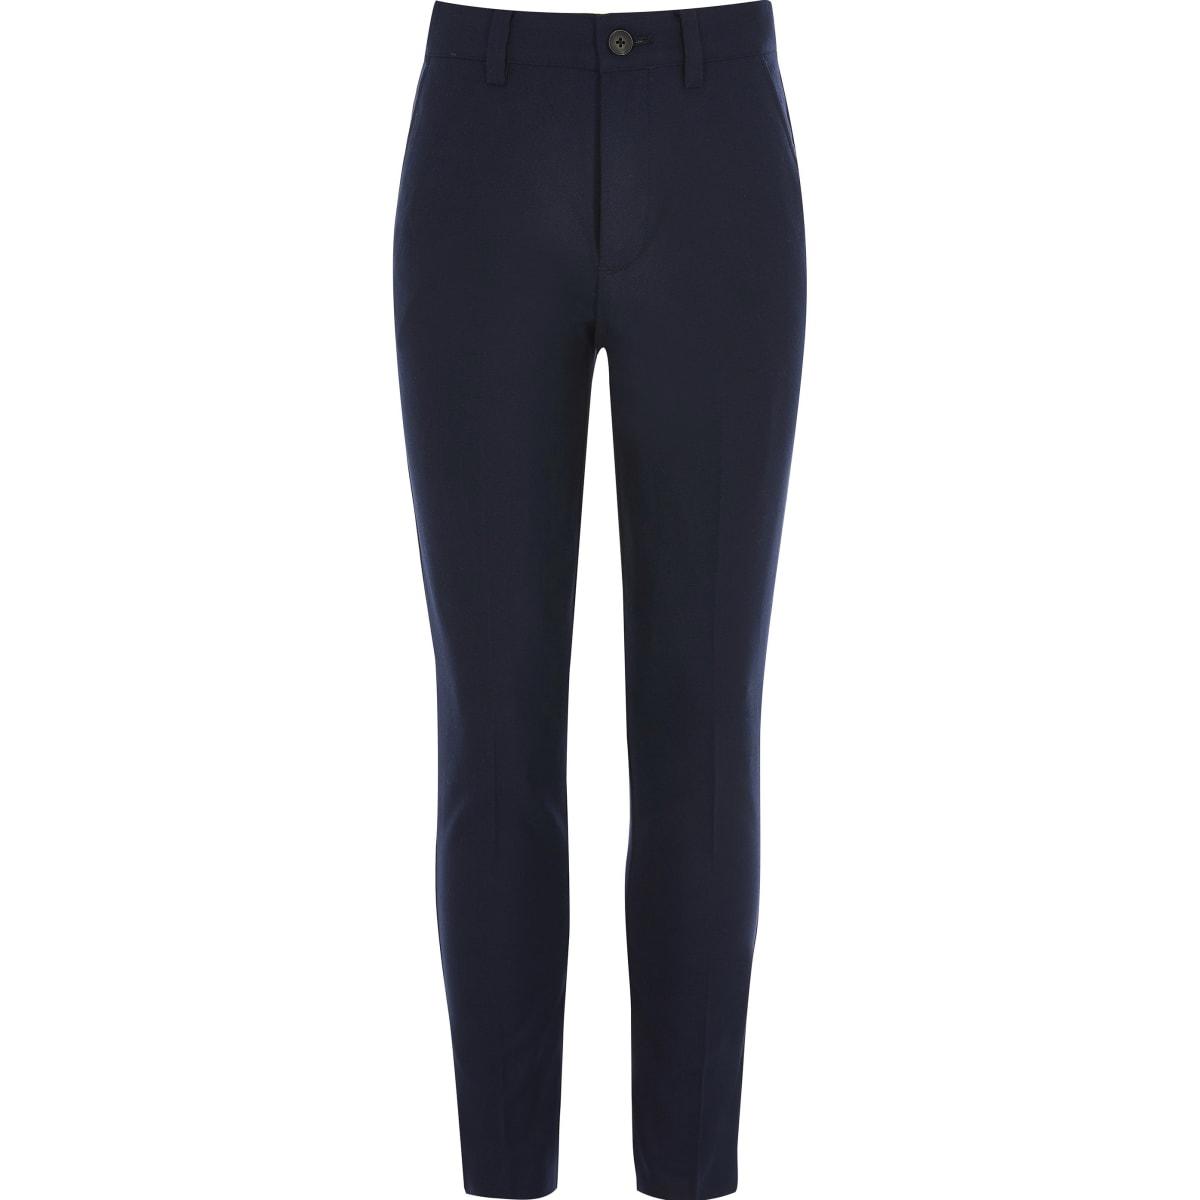 Pantalon skinny bleu marine pour garçon